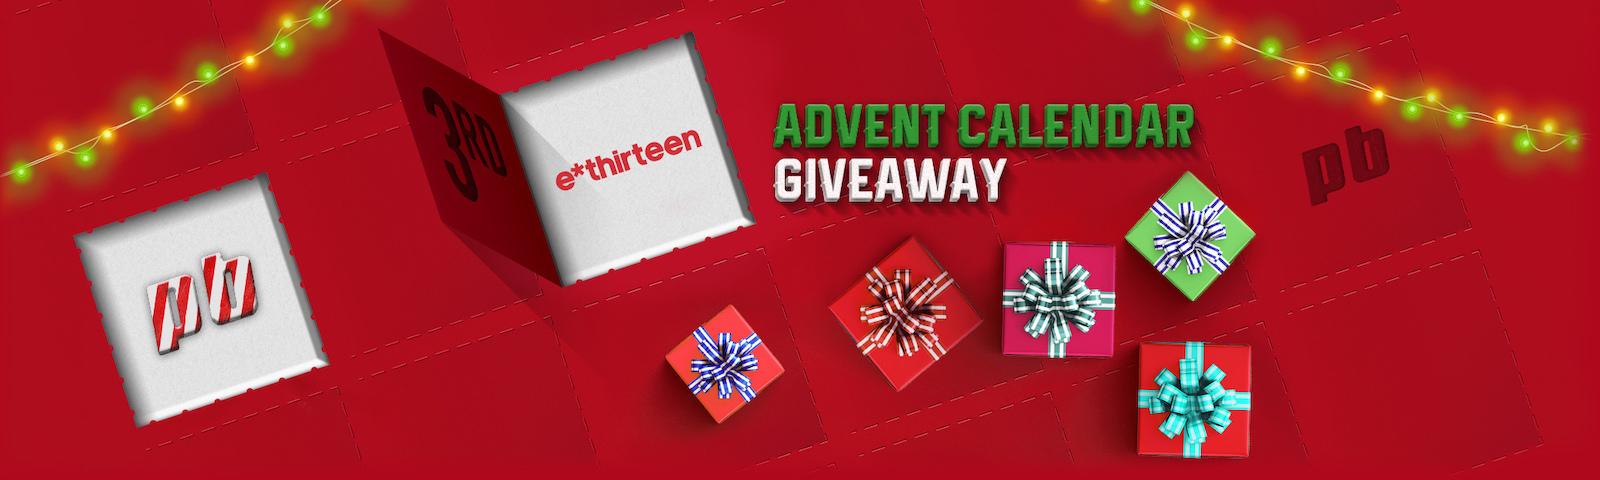 Advent Banner Dec 3 -ethirteen